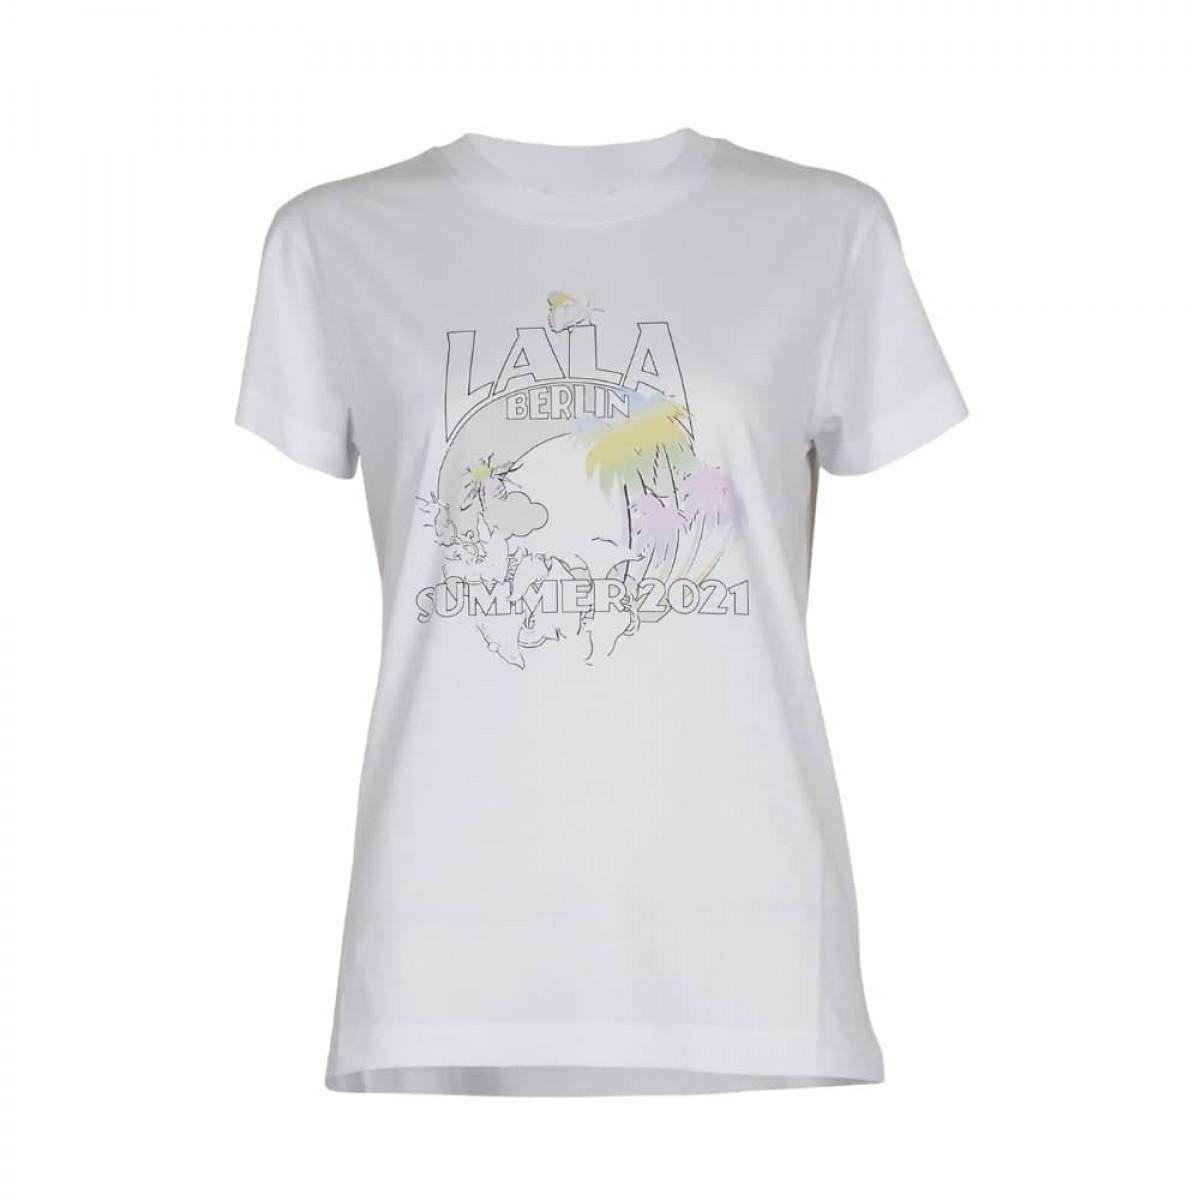 cara oasis t-shirt - white - front